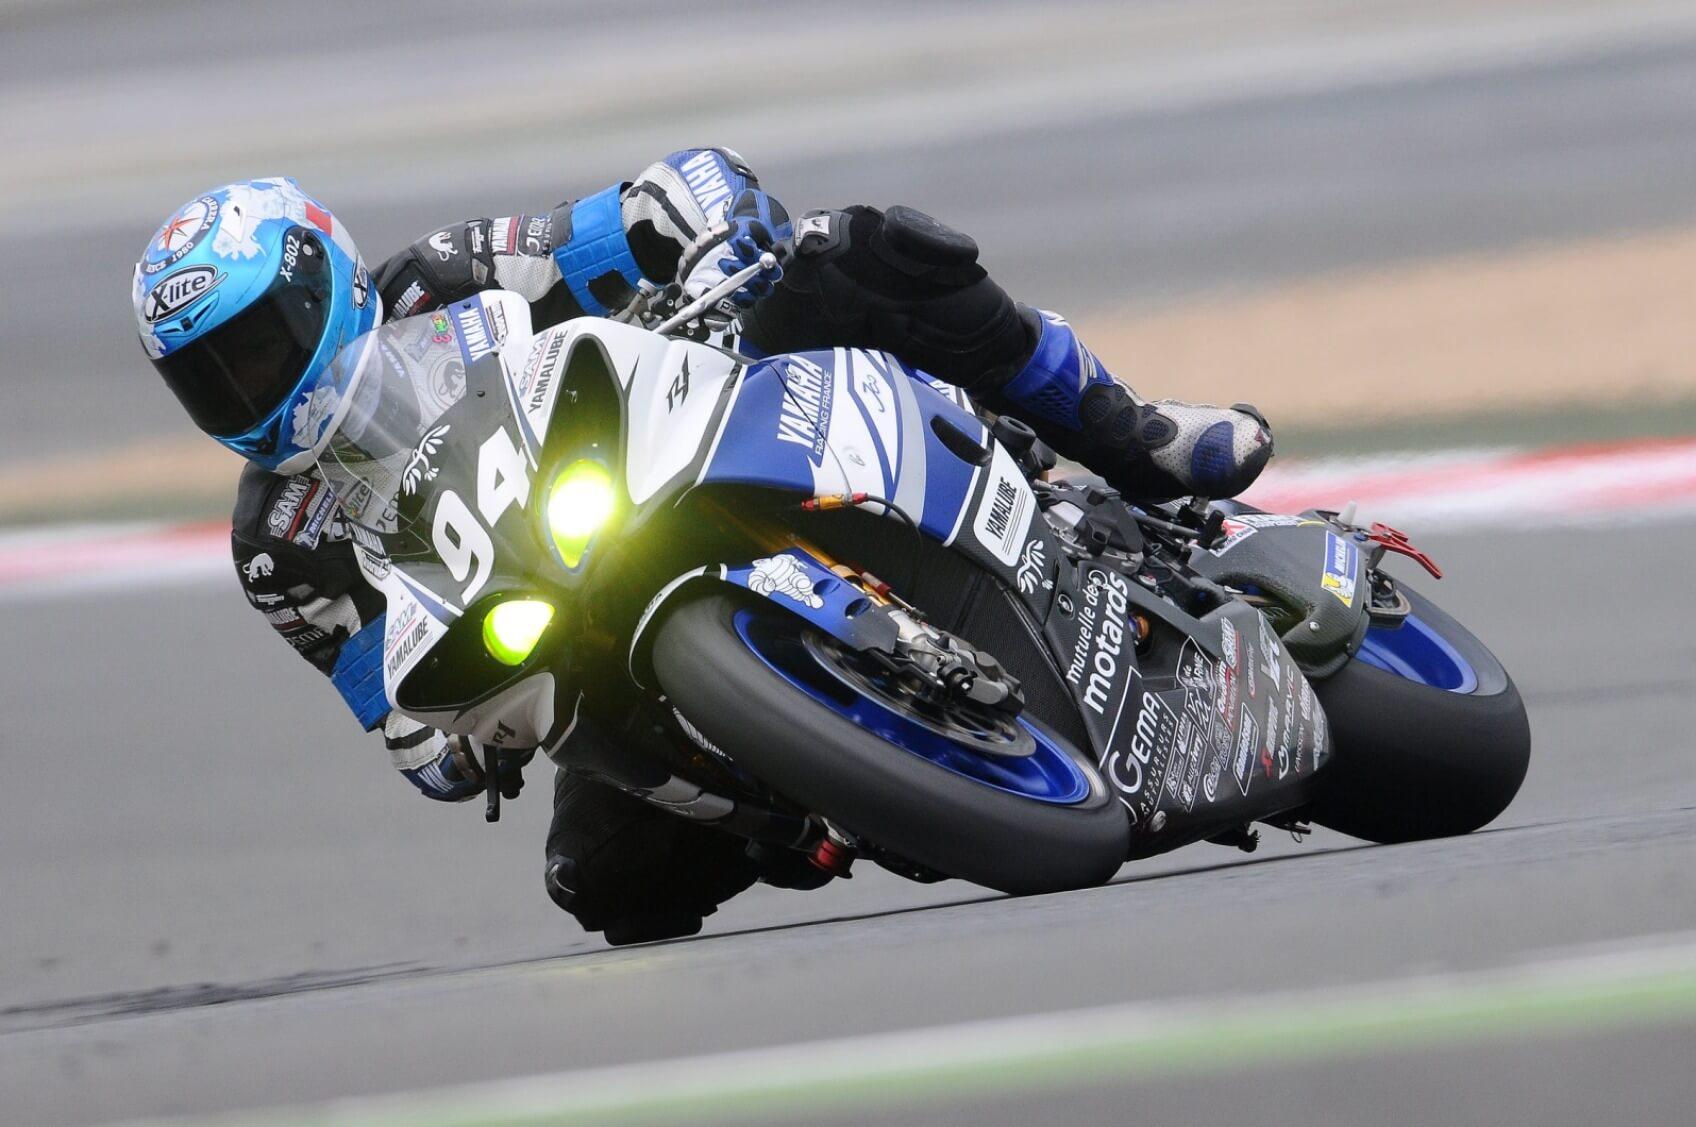 Yamaha motorcycle - Original image